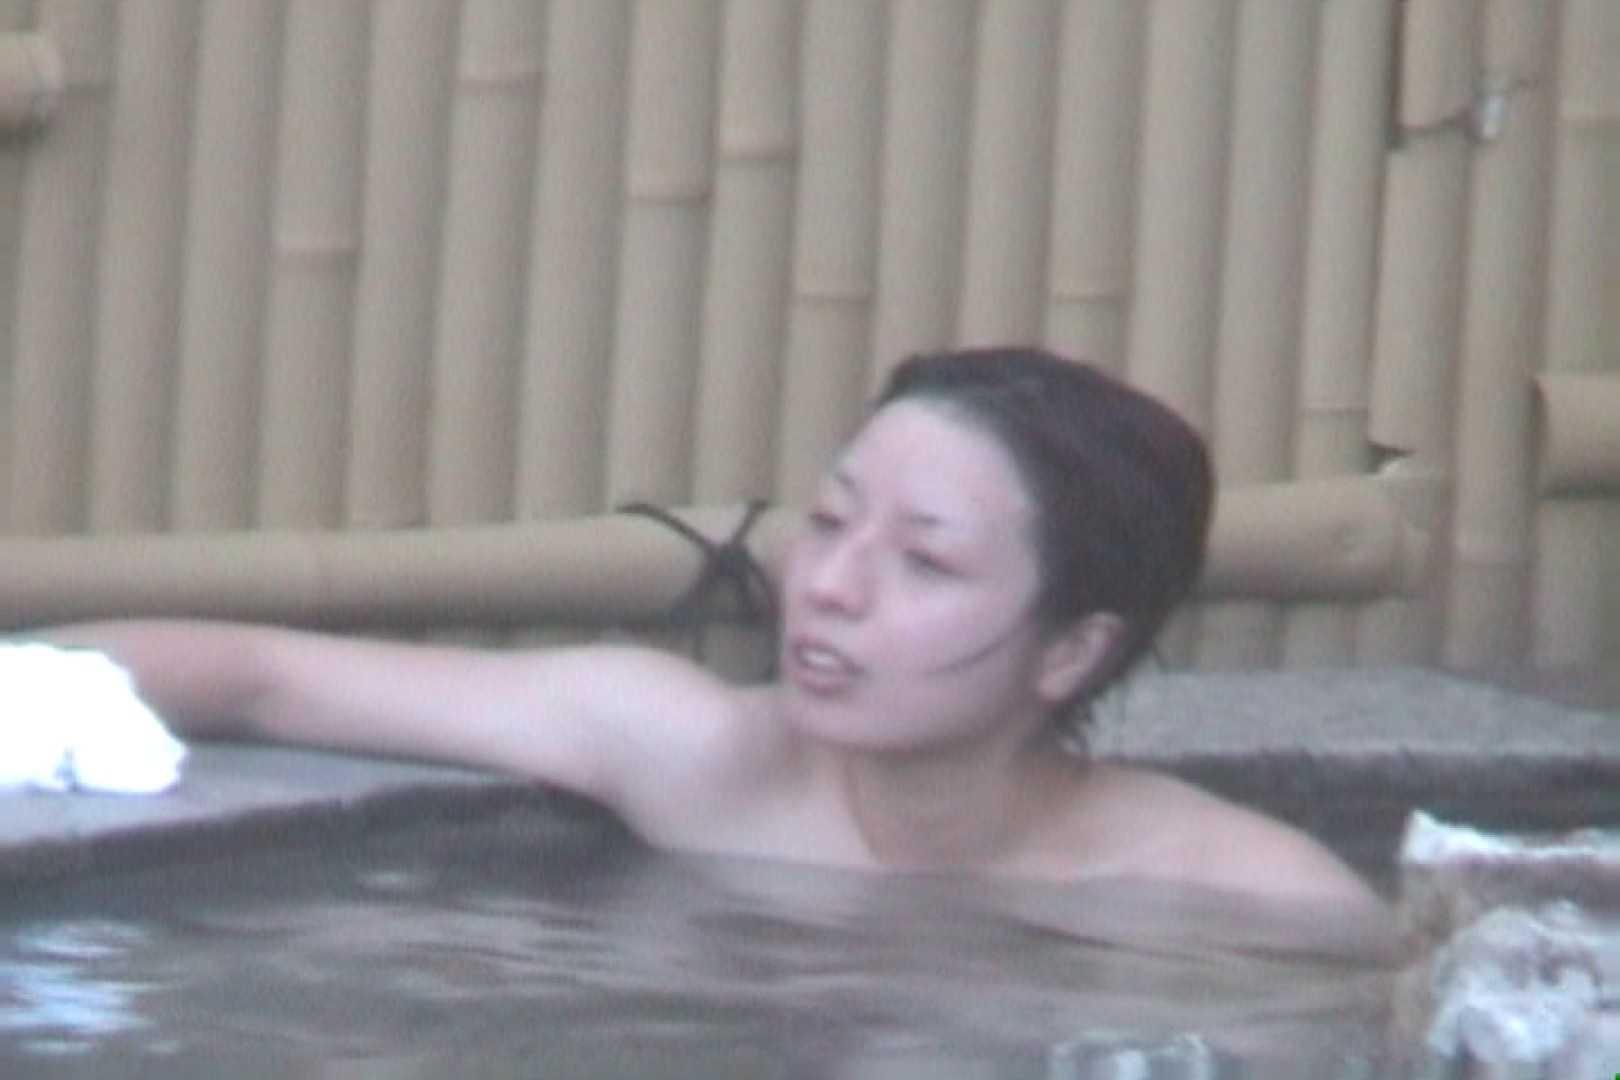 Aquaな露天風呂Vol.608 HなOL | 盗撮  89pic 57